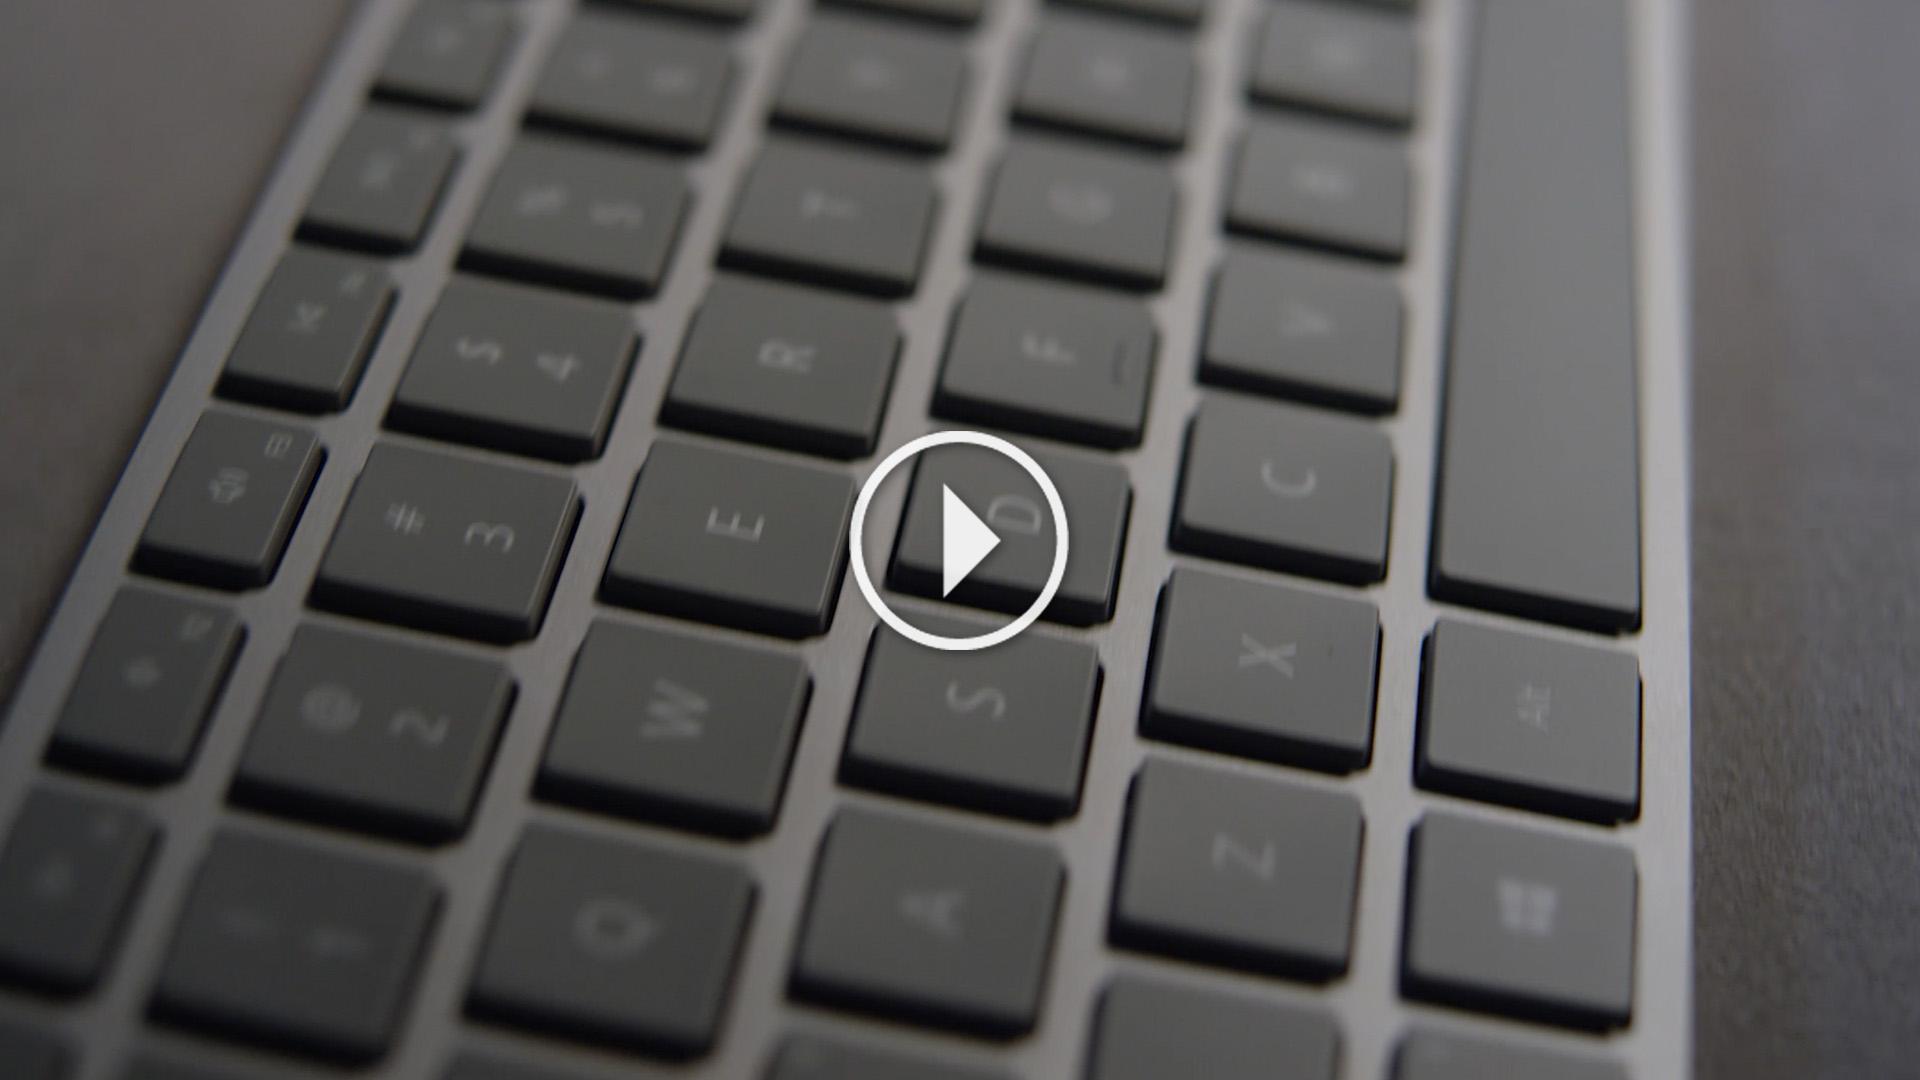 Buy Surface Keyboard - Microsoft Store